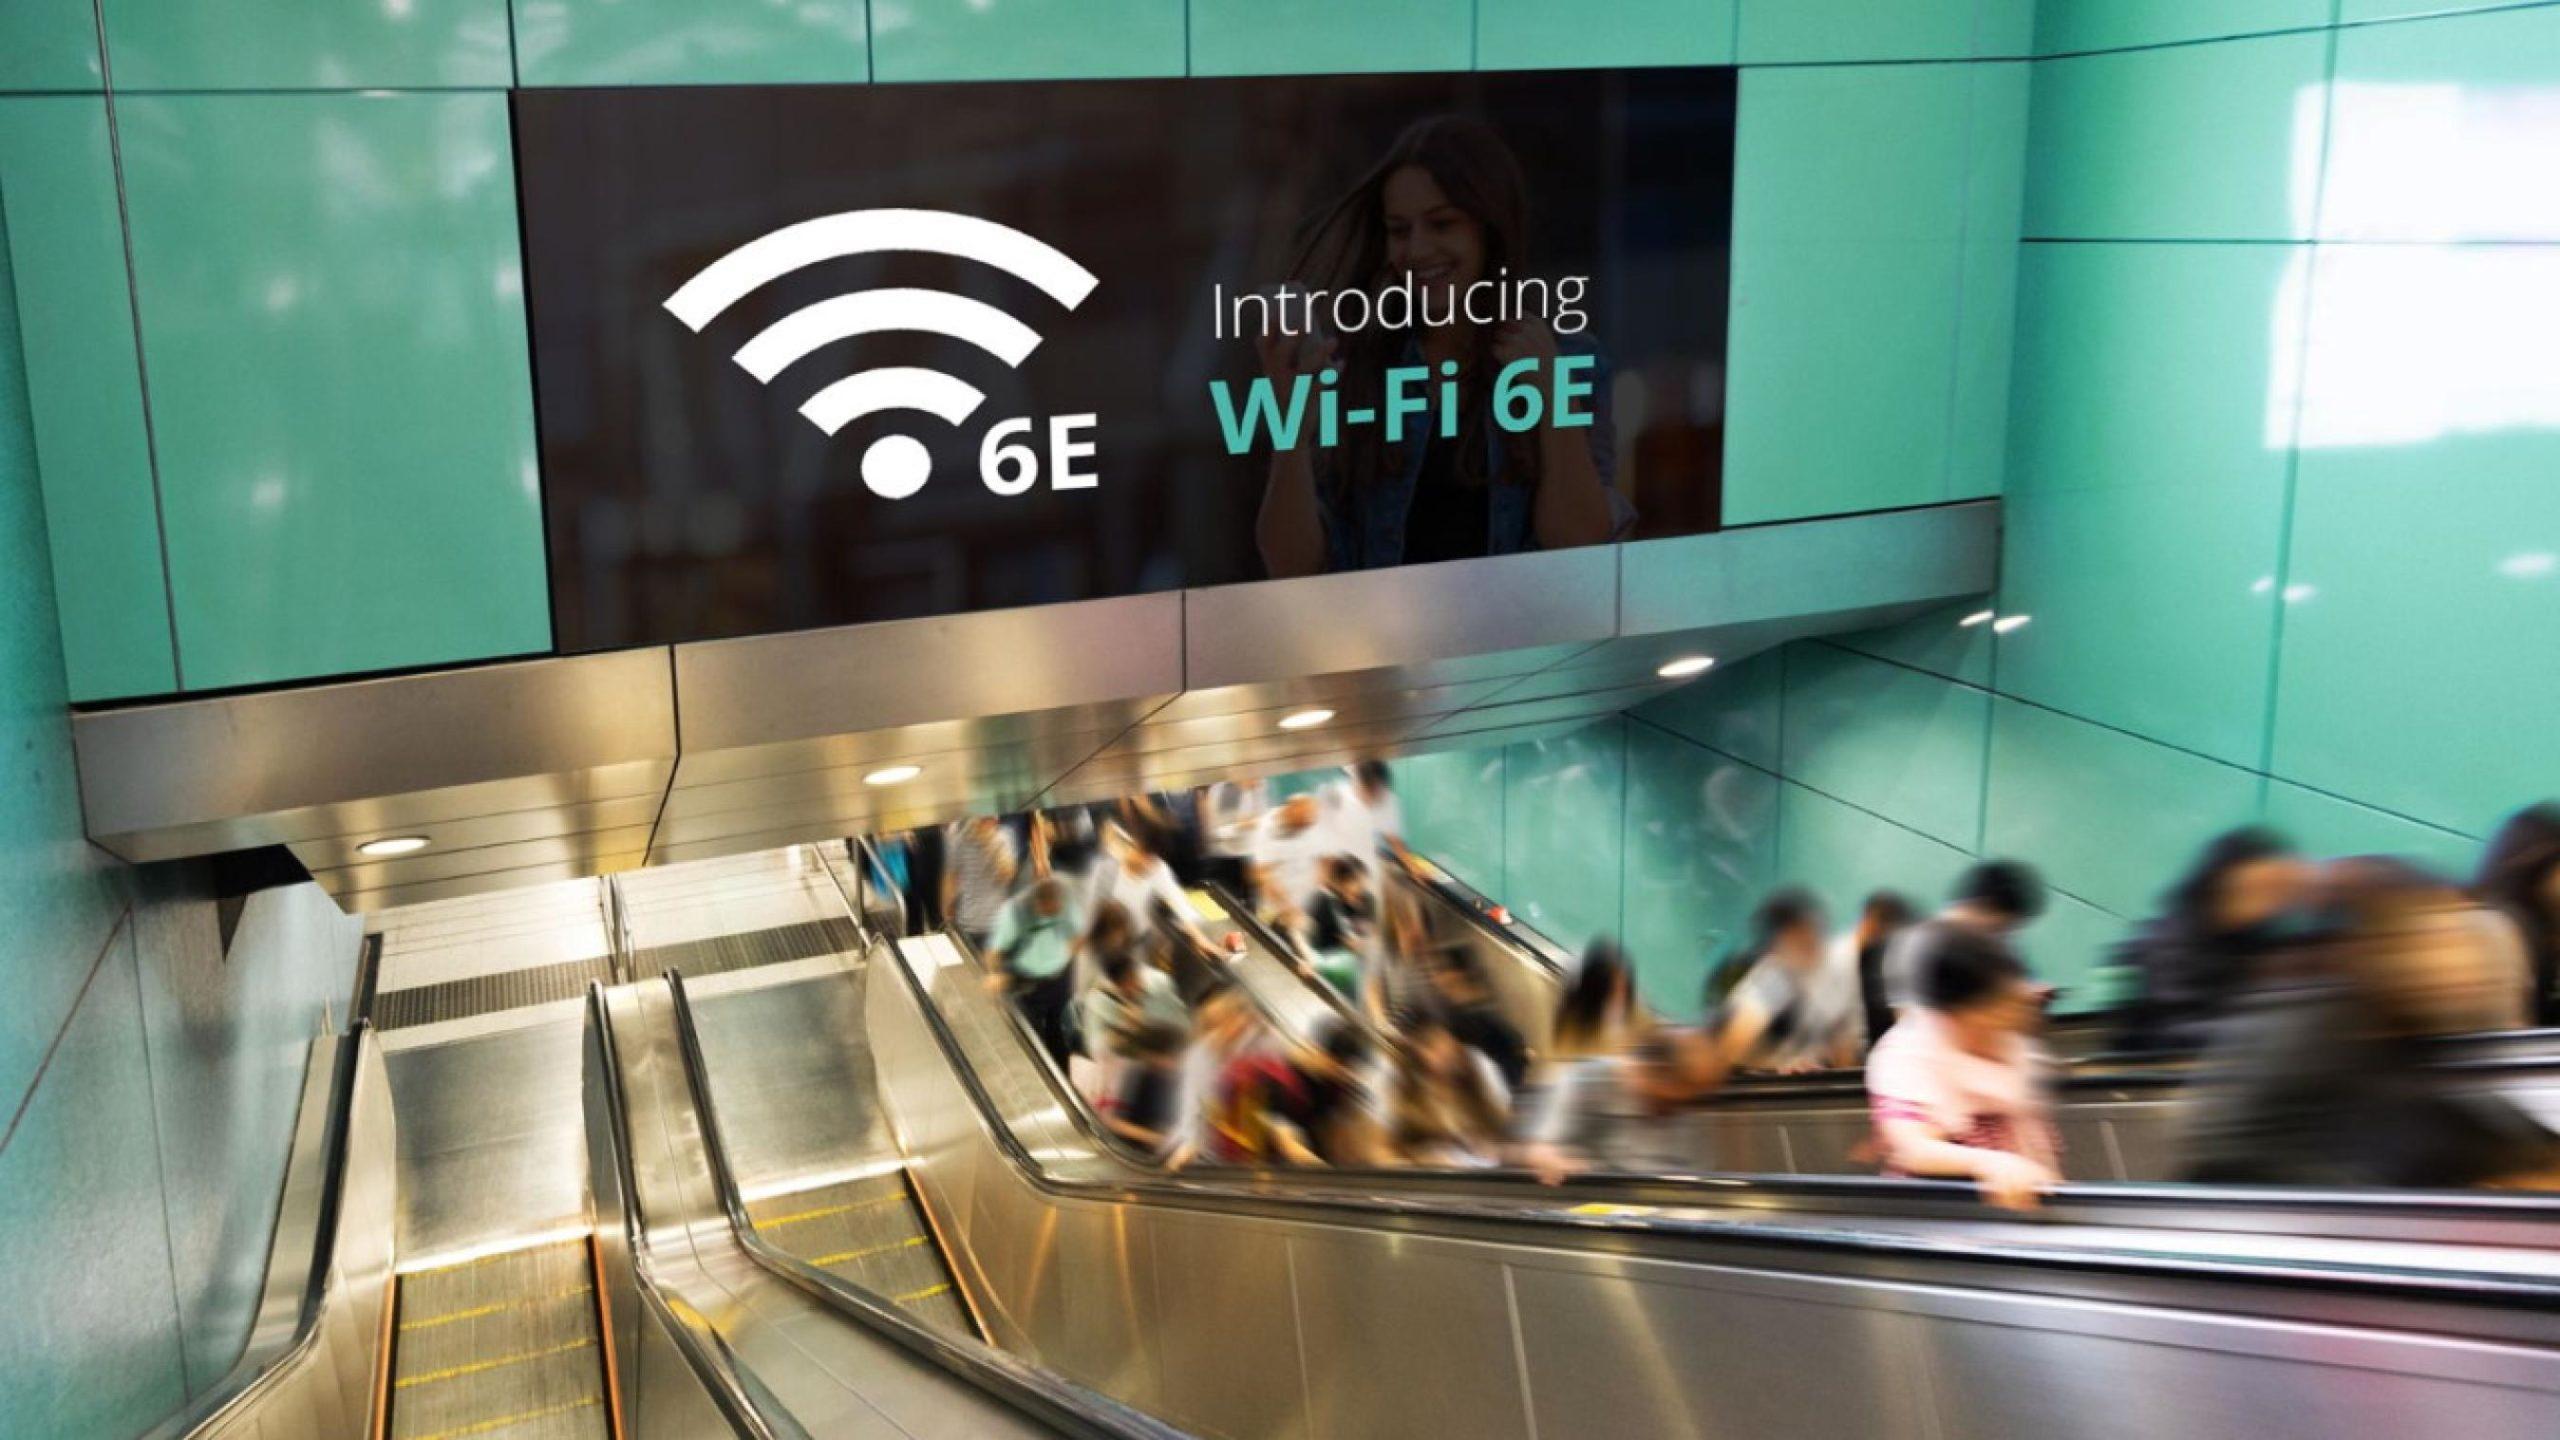 Broadcom Wi-Fi 6E